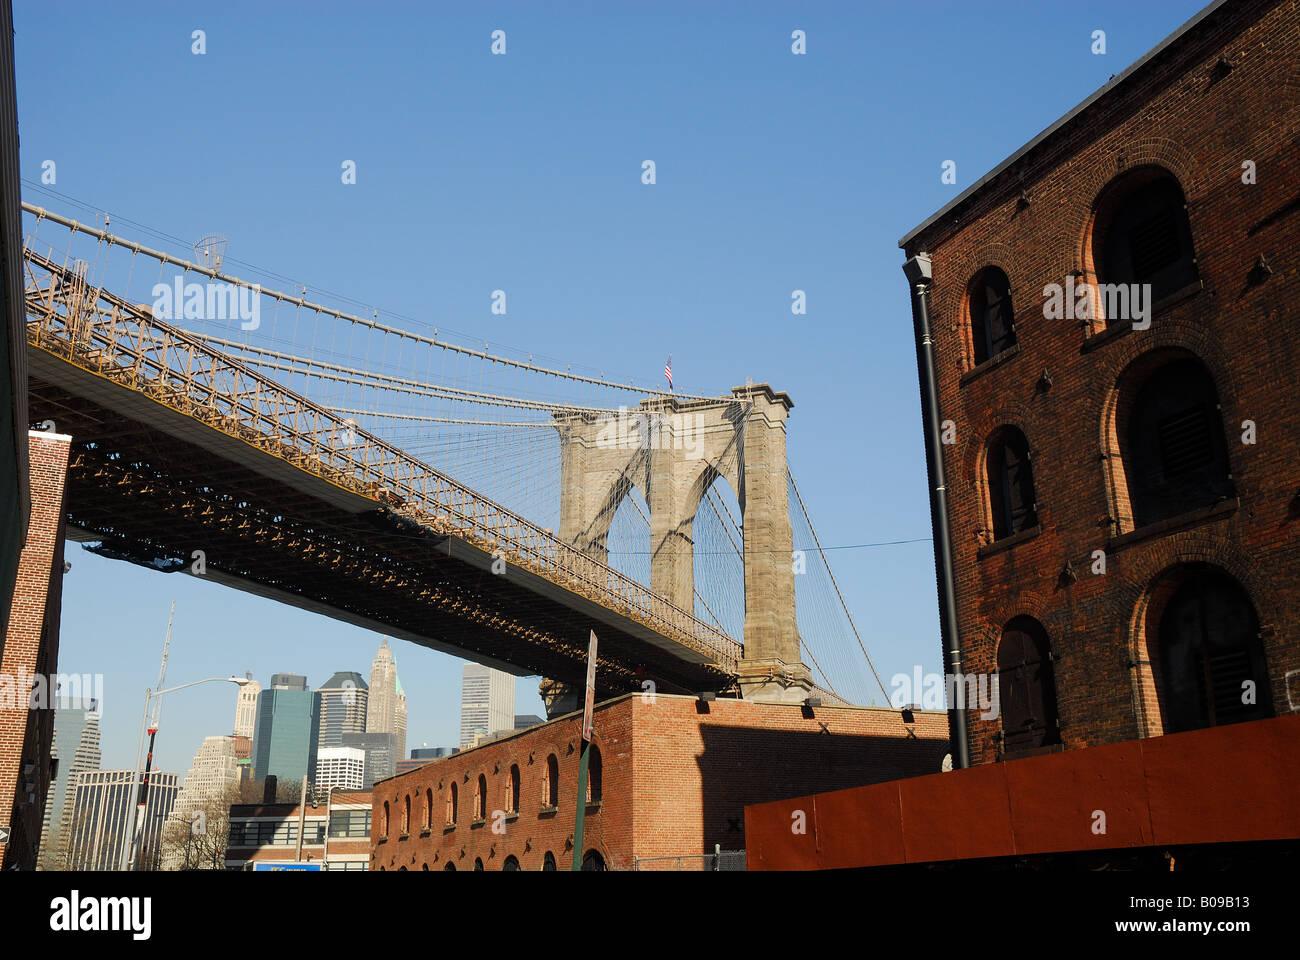 Brooklyn Bridge from a backstreet in Brooklyn, New York Stock Photo